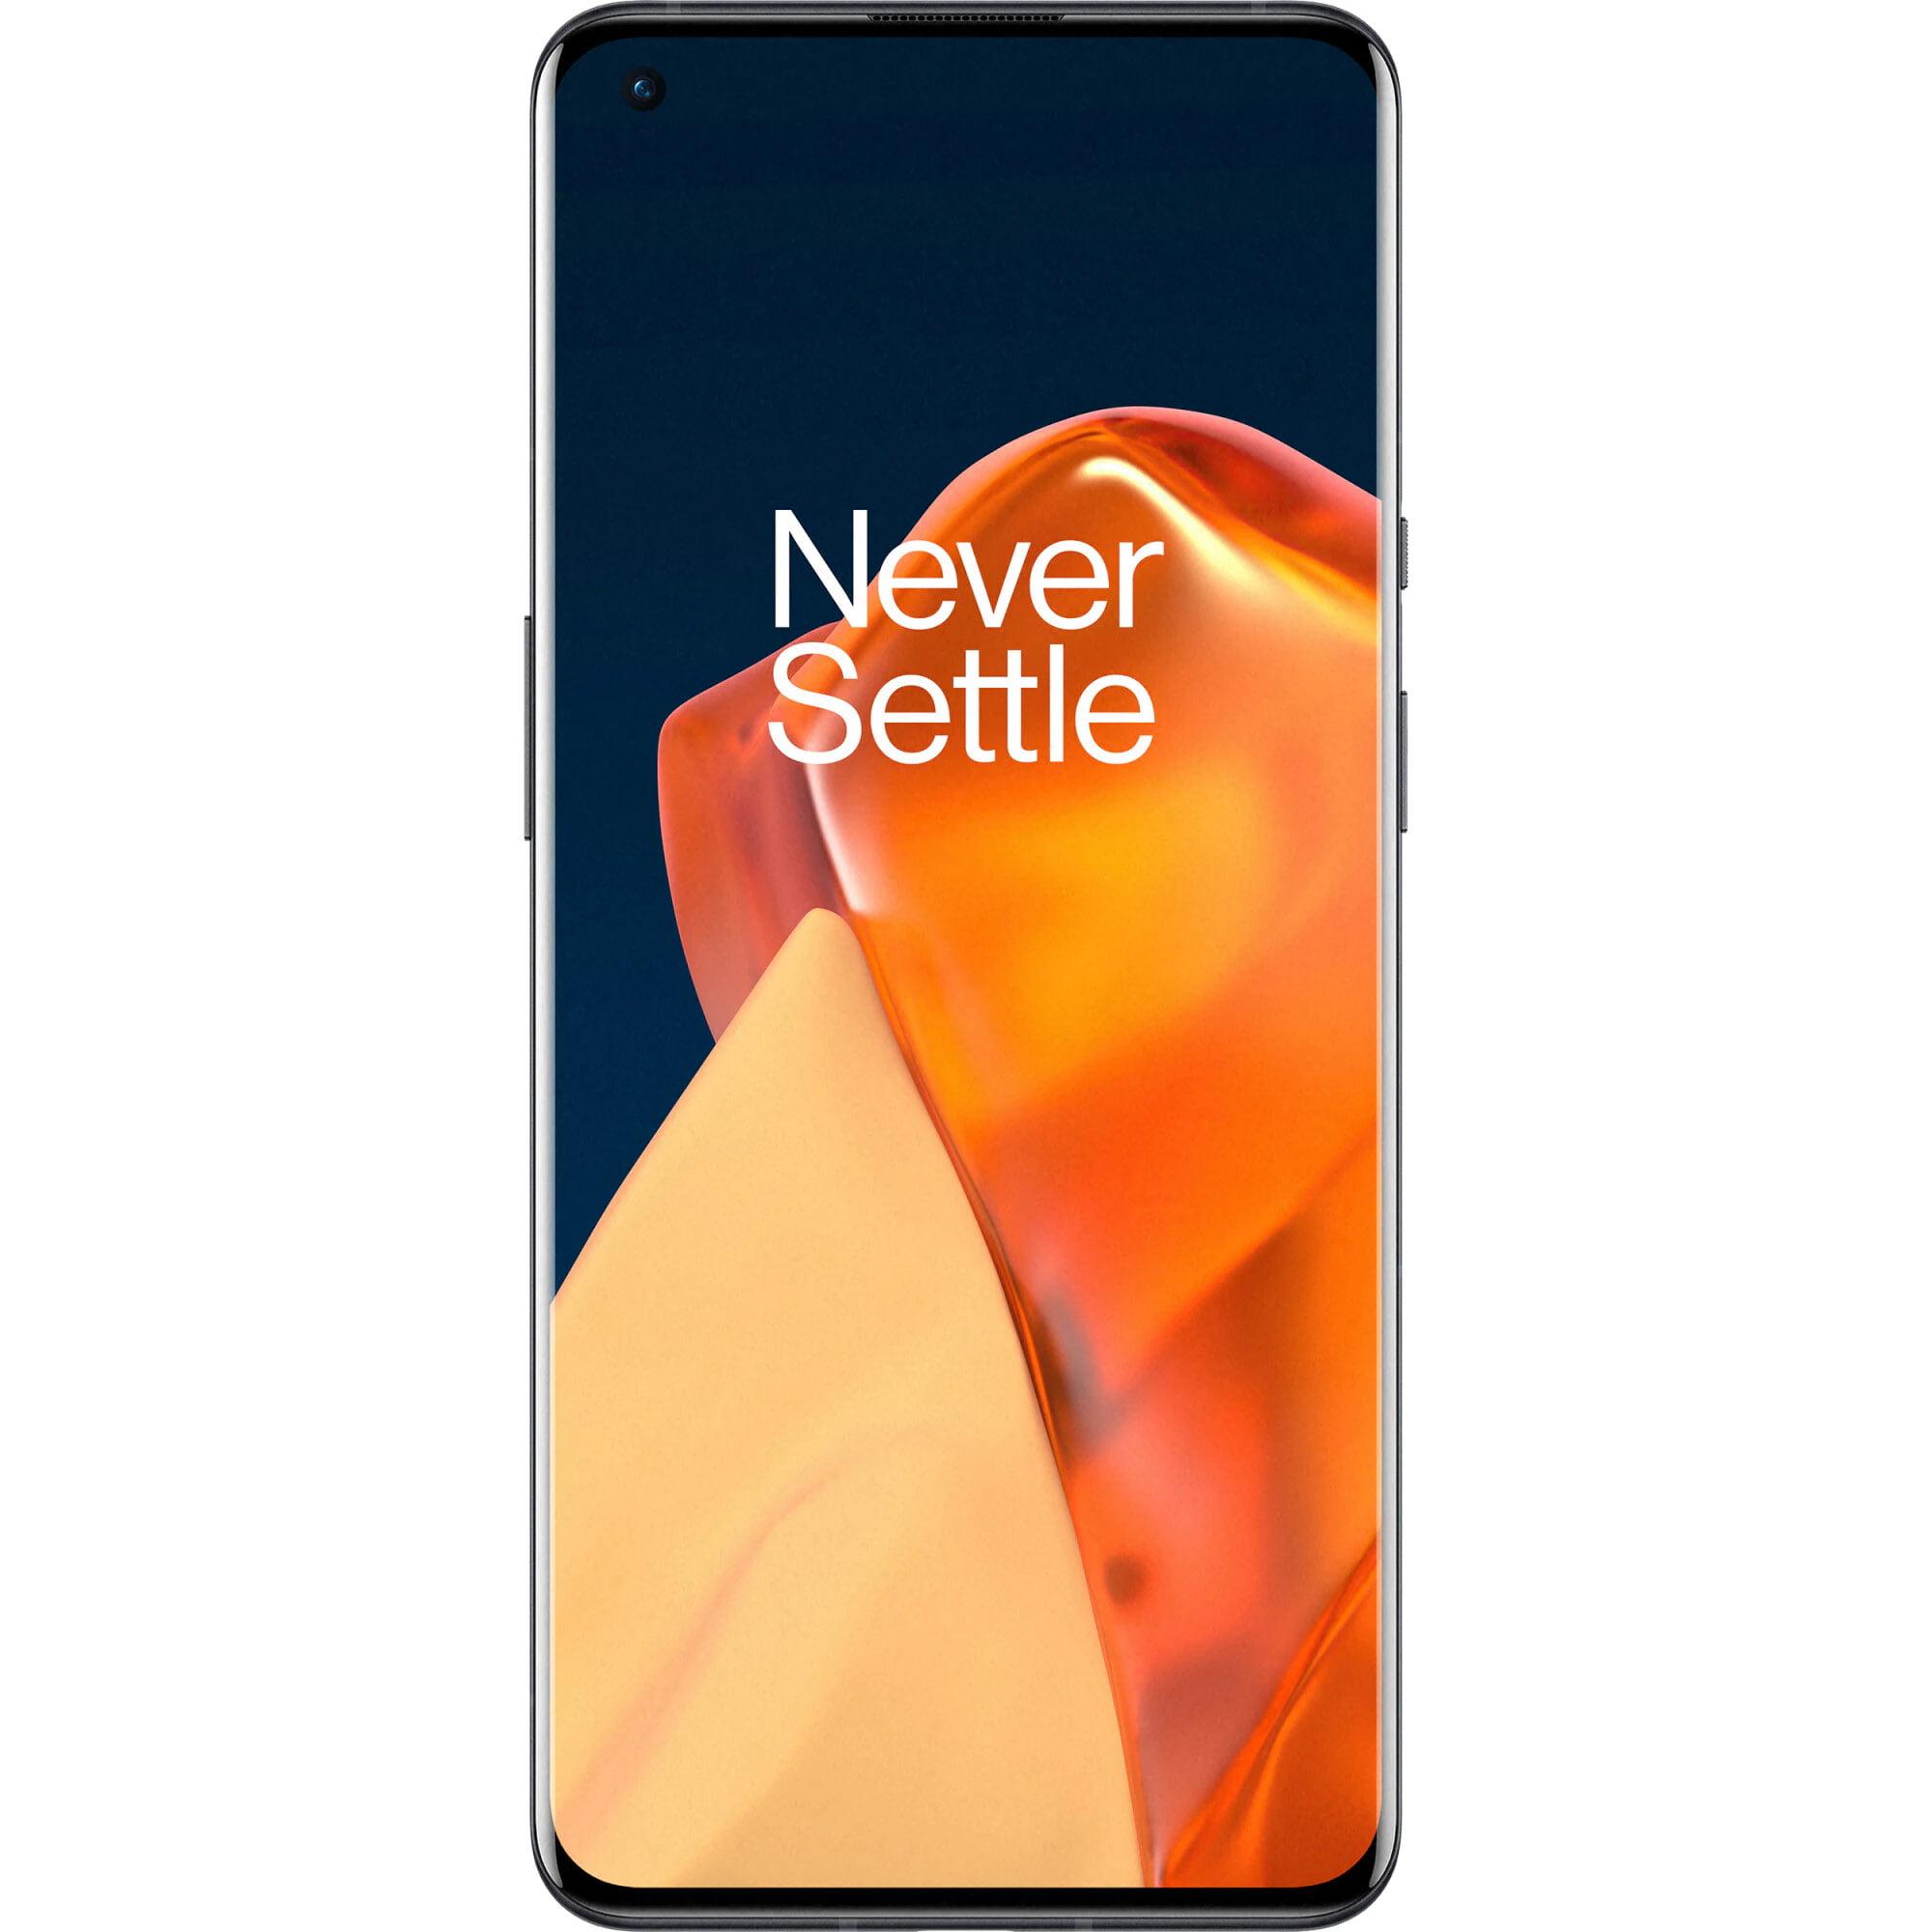 Telefon mobil OnePlus 9 Pro, Dual SIM, 256GB, 12GB RAM, 5G, Stellar Black